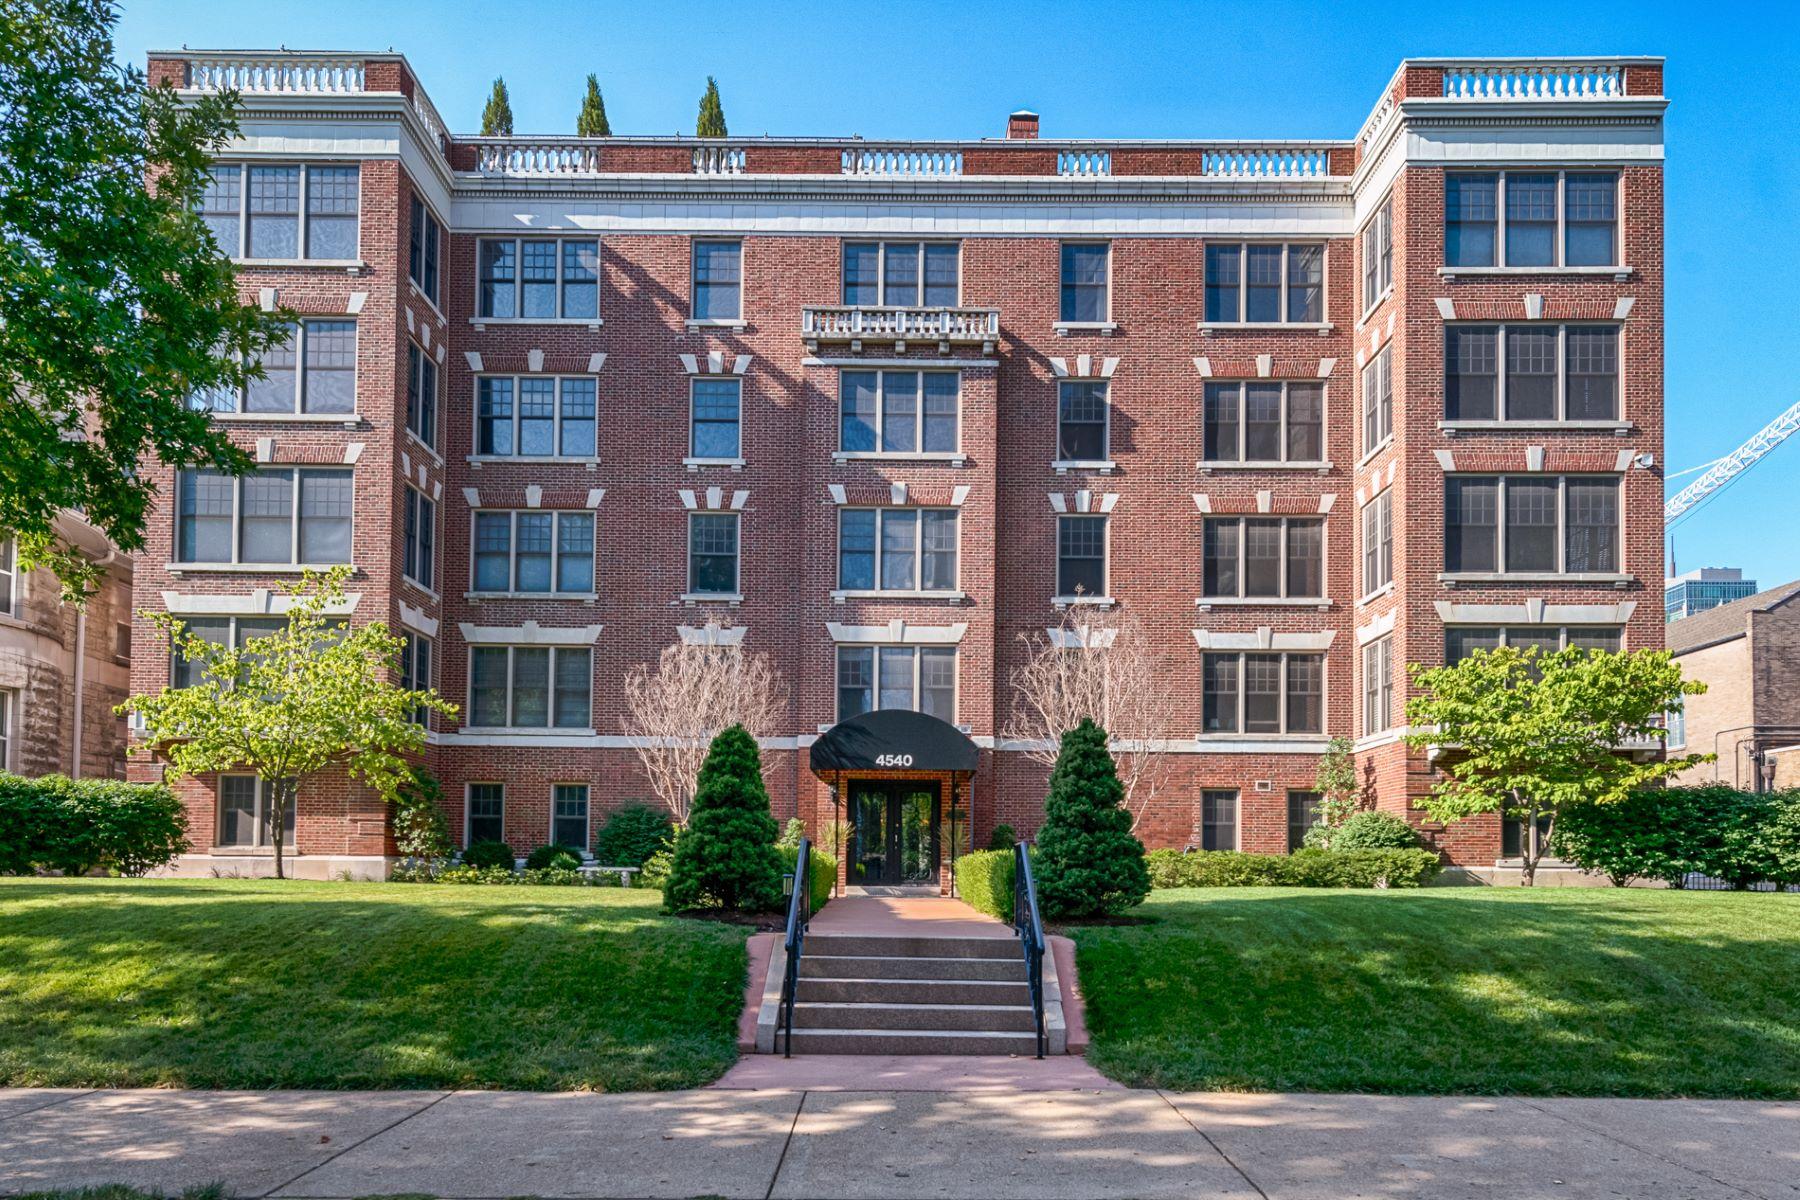 Condominium for Sale at Lindell Blvd 4540 Lindell Blvd # 401 St. Louis, Missouri 63108 United States